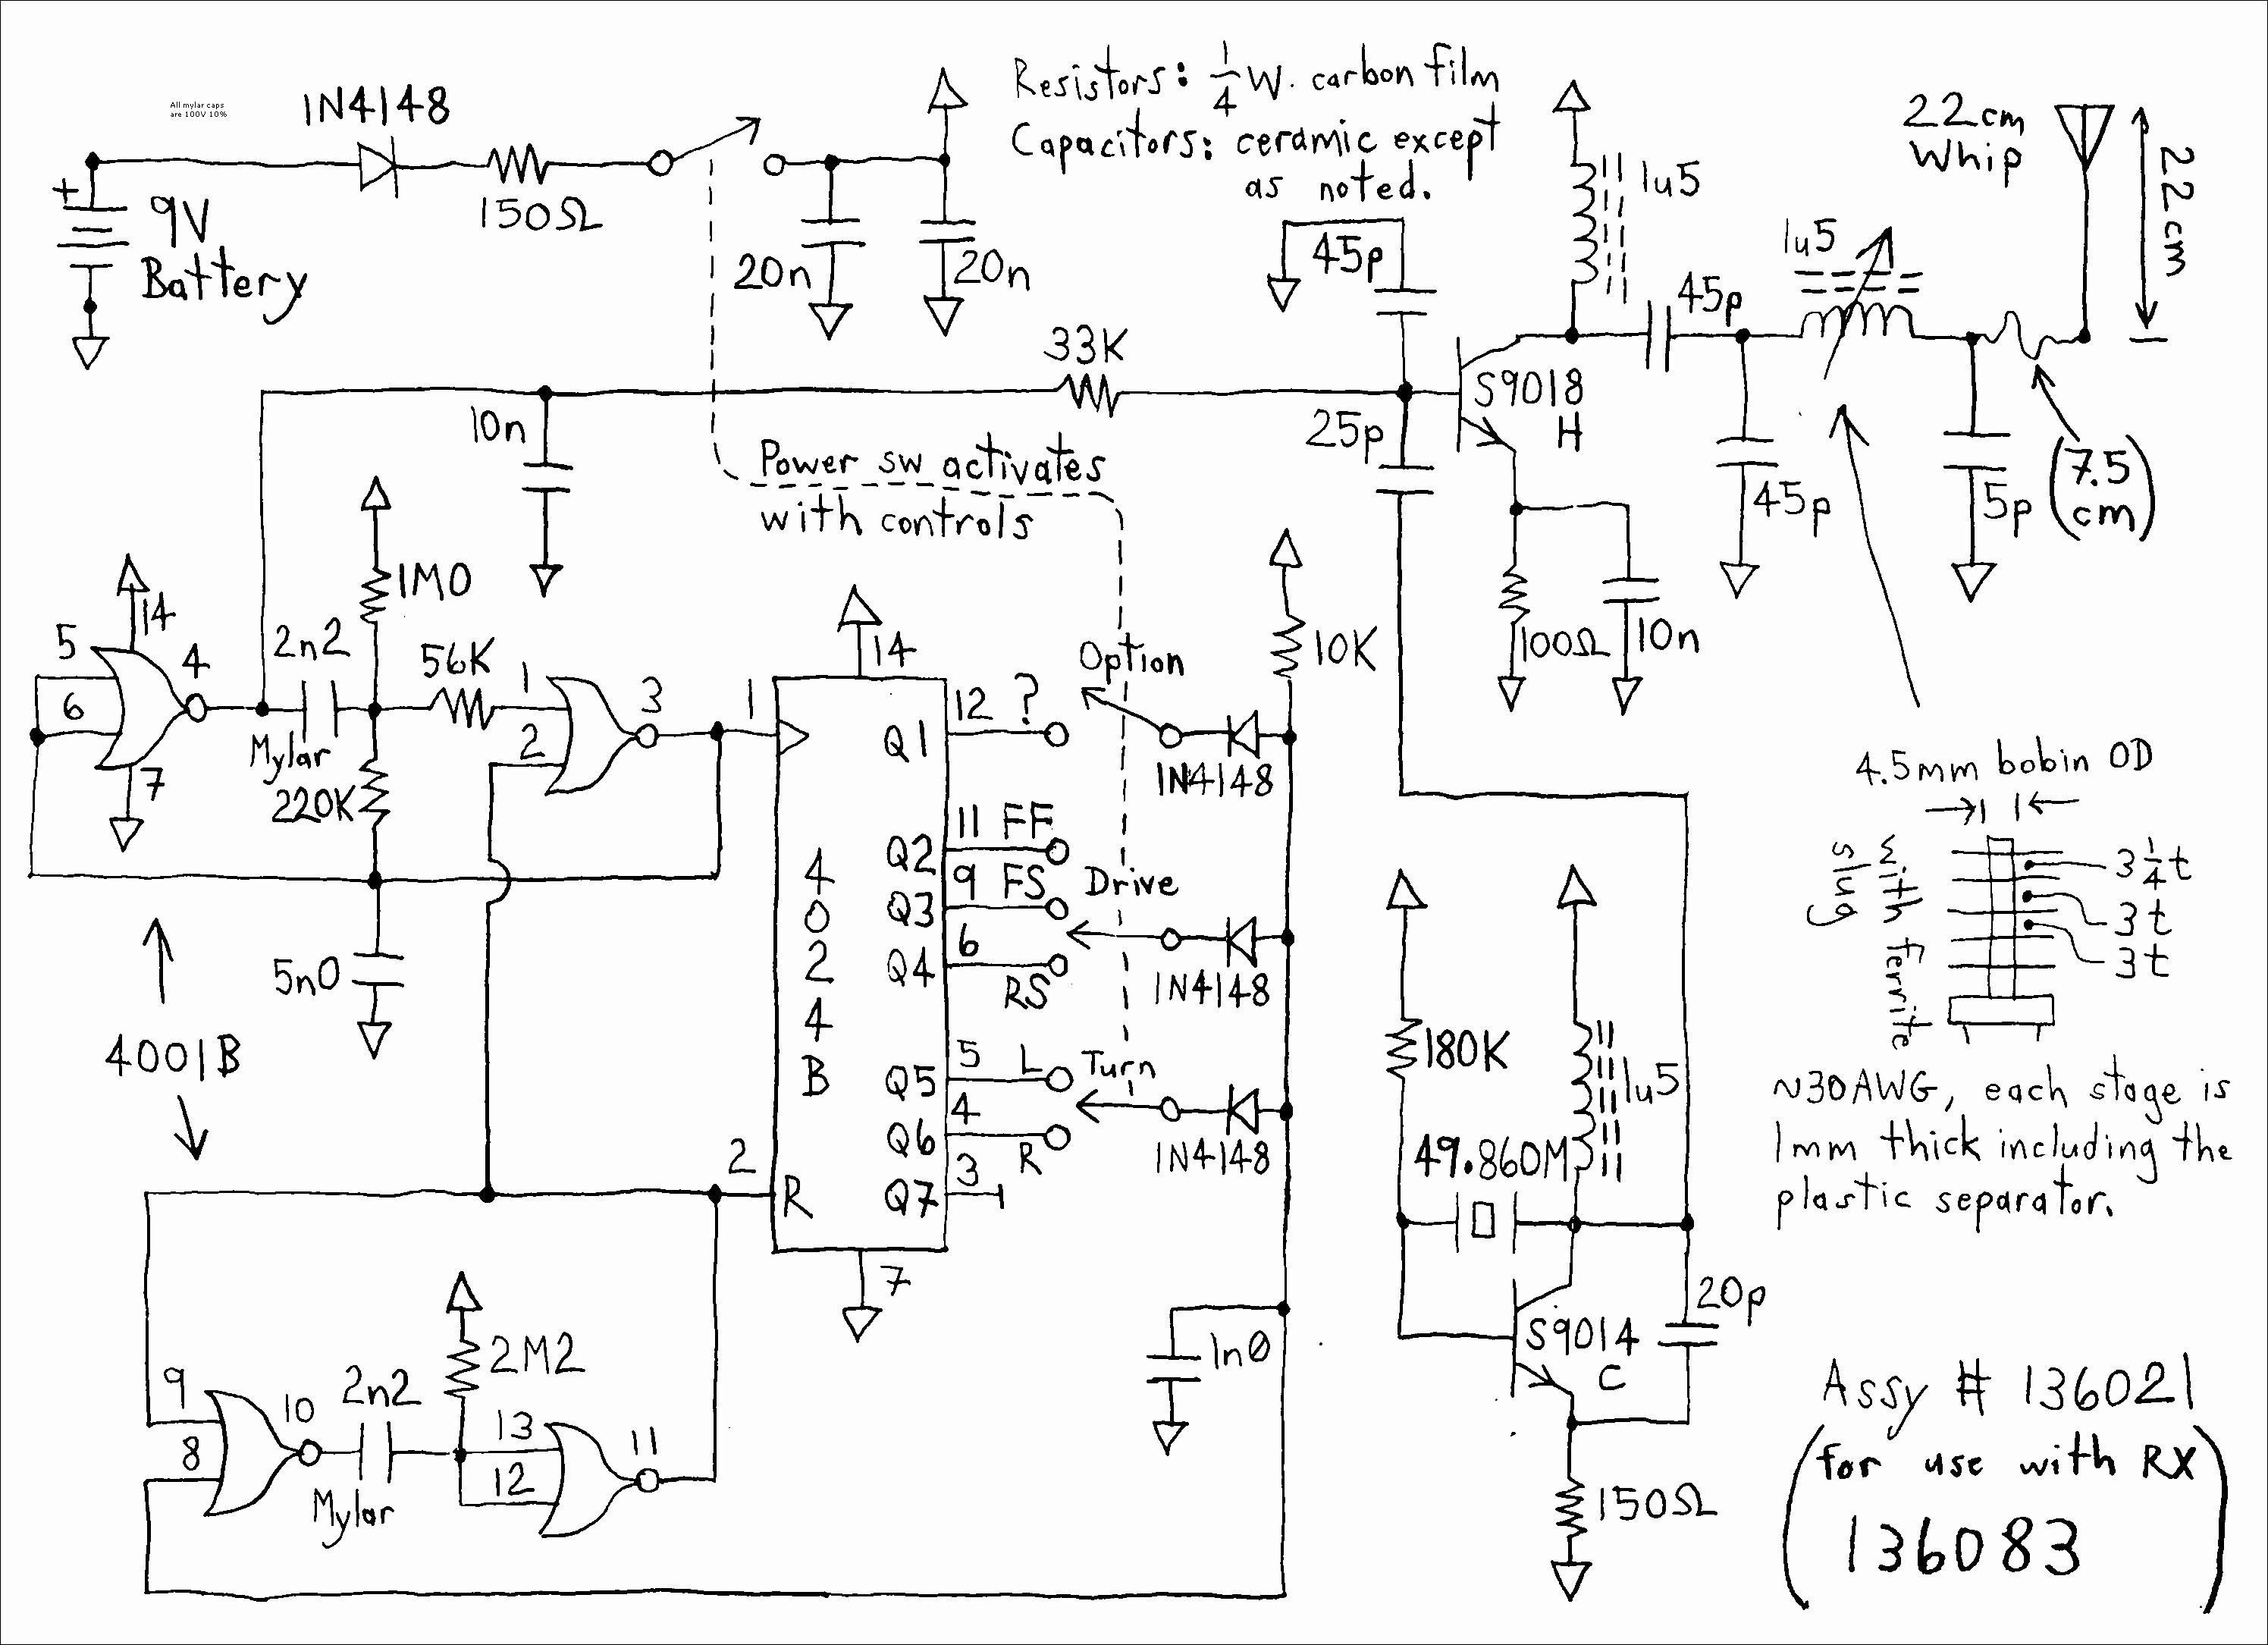 Jl Audio Wiring Diagram | Best Wiring Library - Jl Audio 500 1 Wiring Diagram